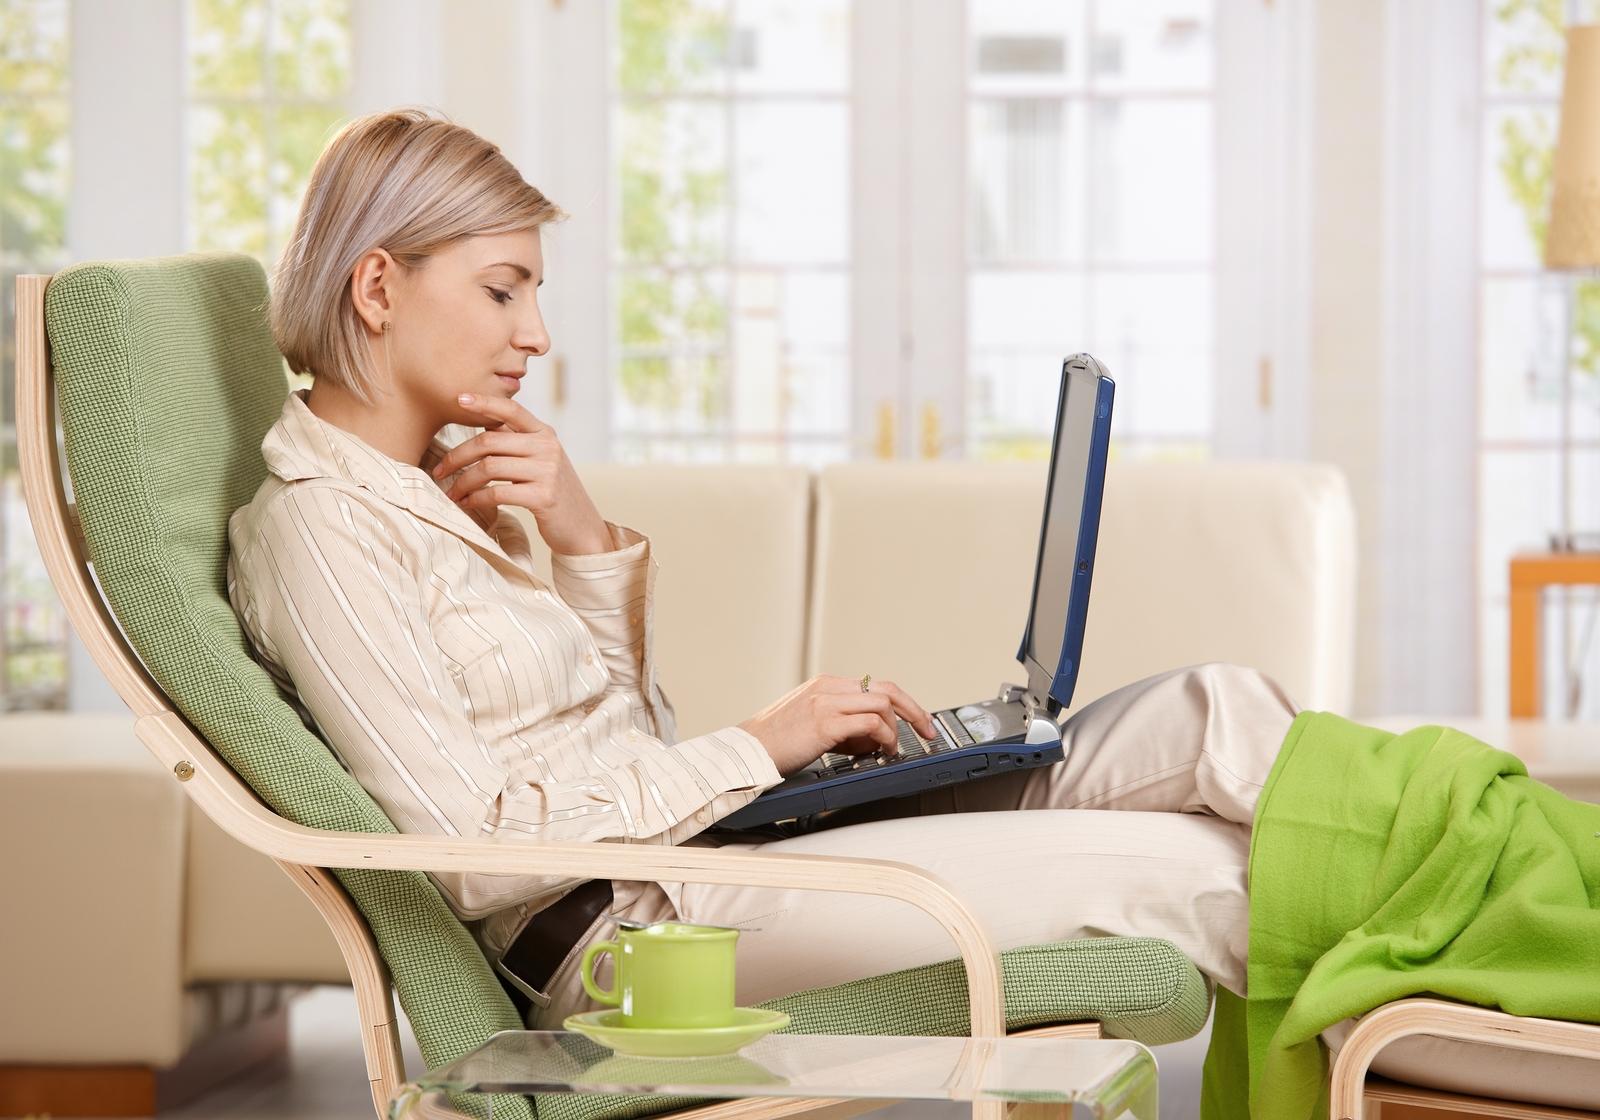 Специалист поиска клиентов (работа с досками объявлений)